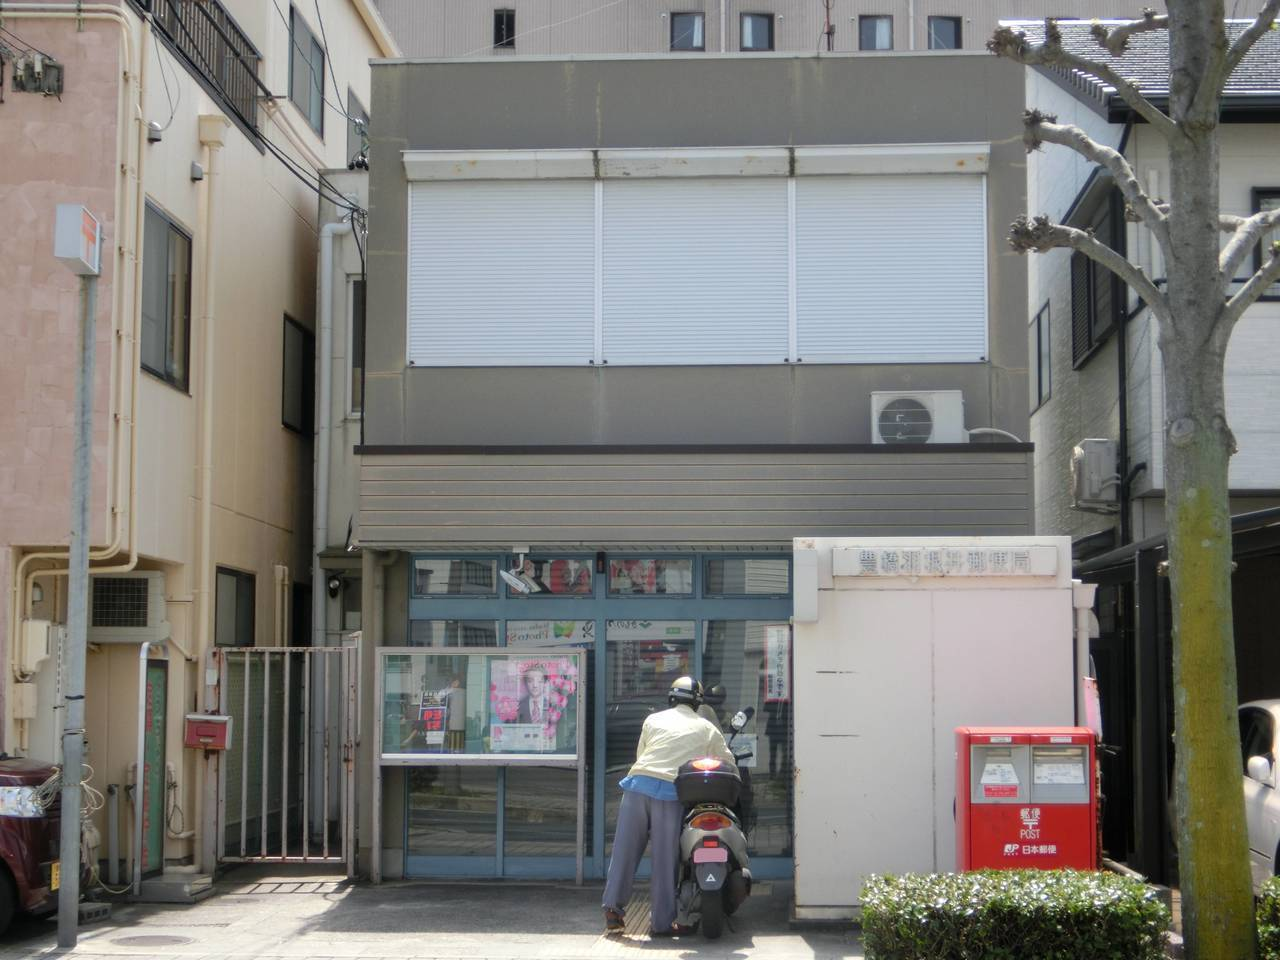 【郵便局】豊橋羽根井郵便局まで徒歩7分(516m)